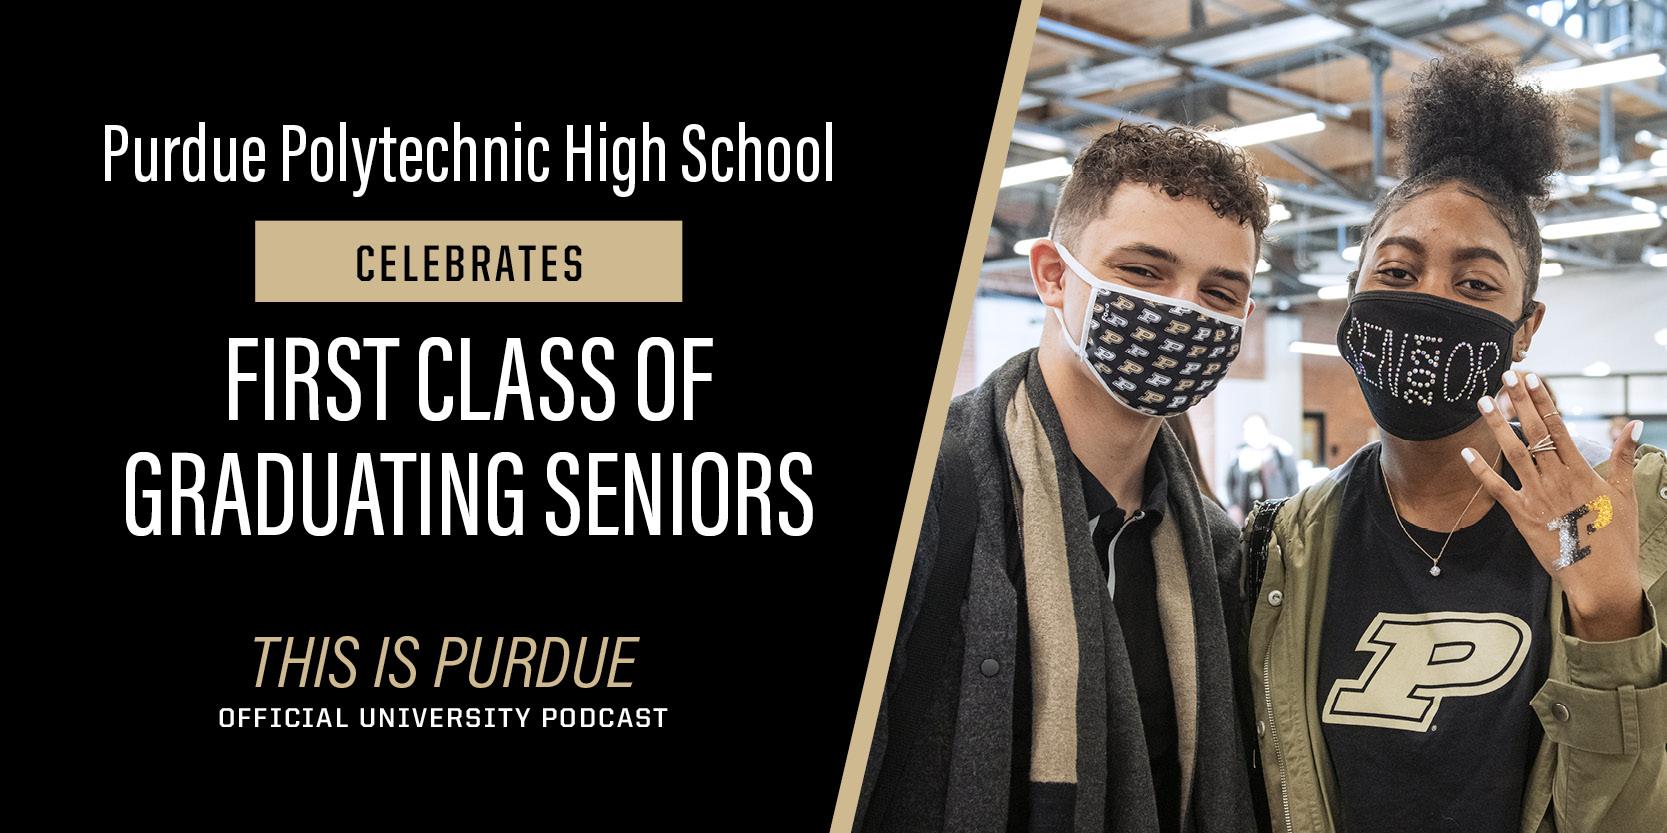 Purdue Polytechnic High School Celebrates First Class of Graduating Seniors